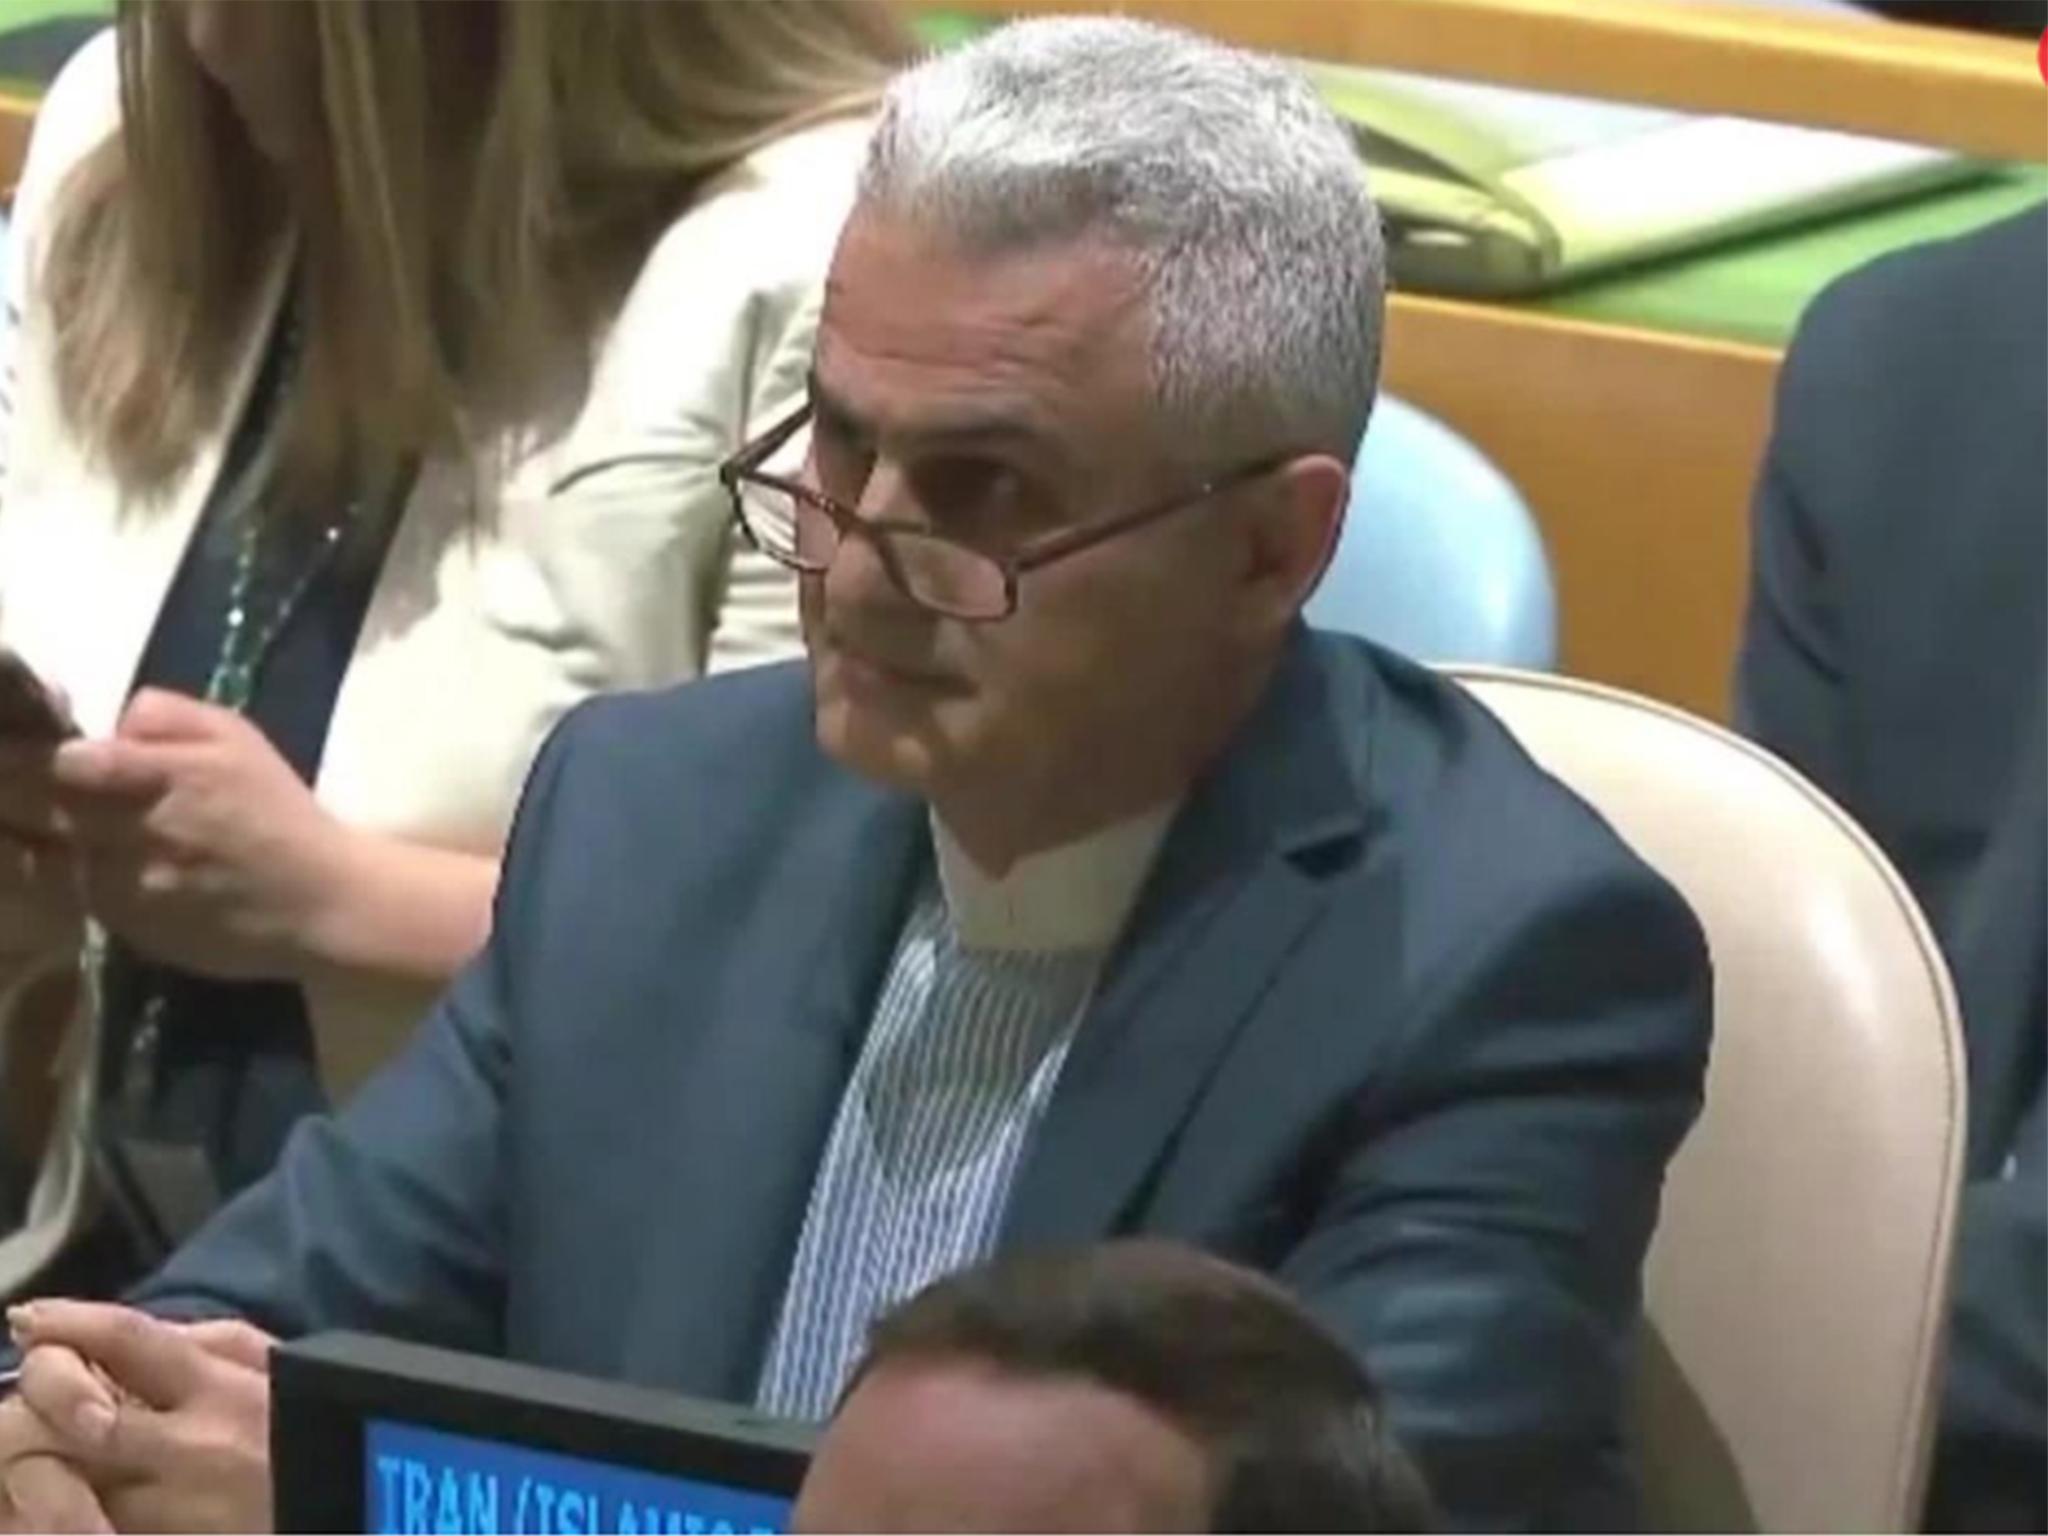 Diplomats struggle to hide their anger at Donald Trump's UN speech